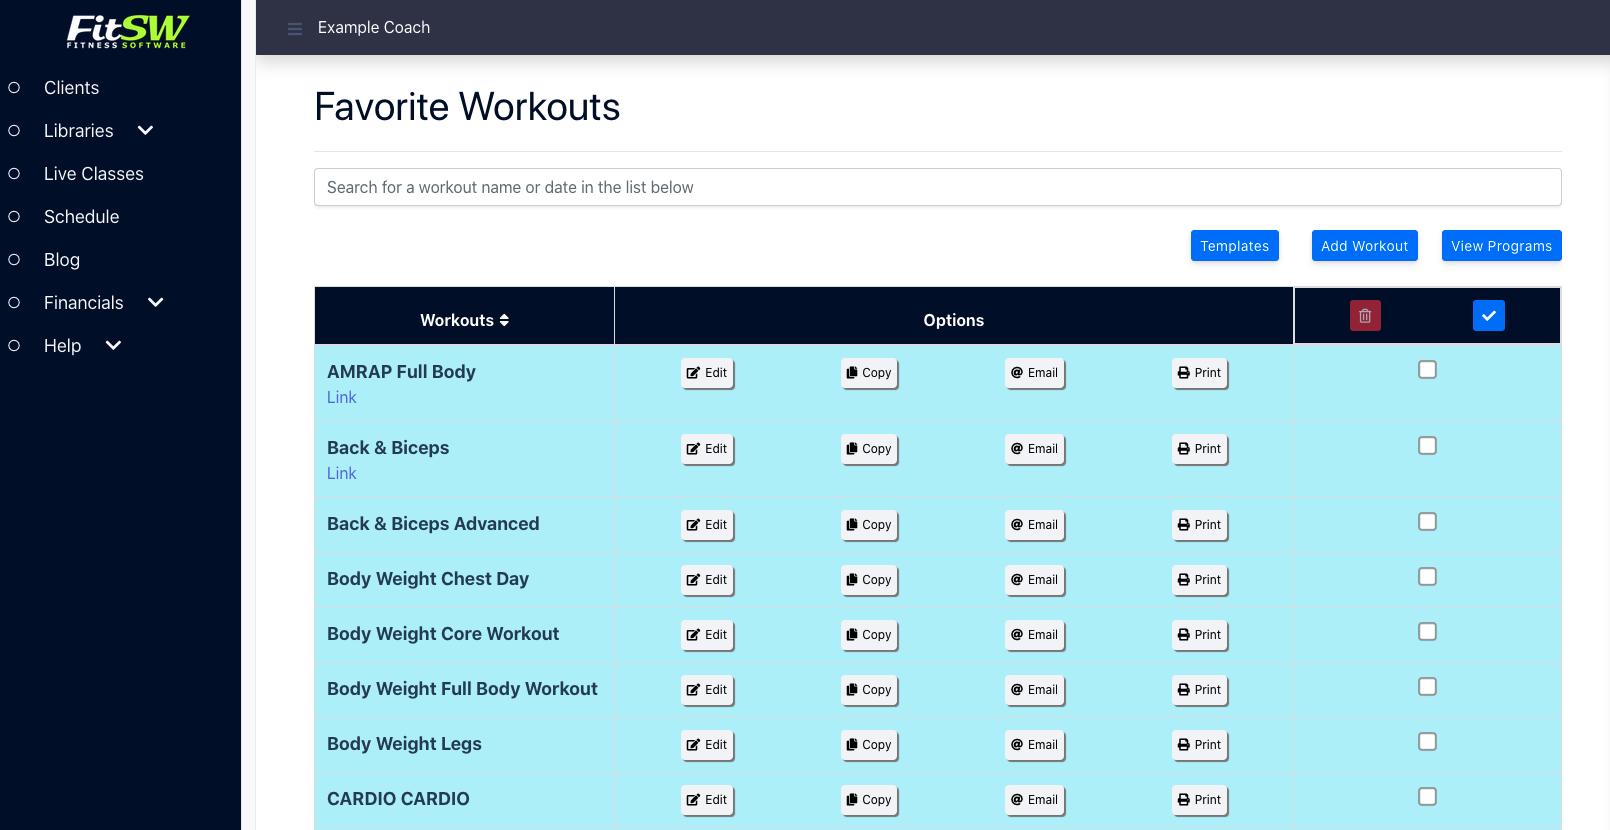 Save Workouts